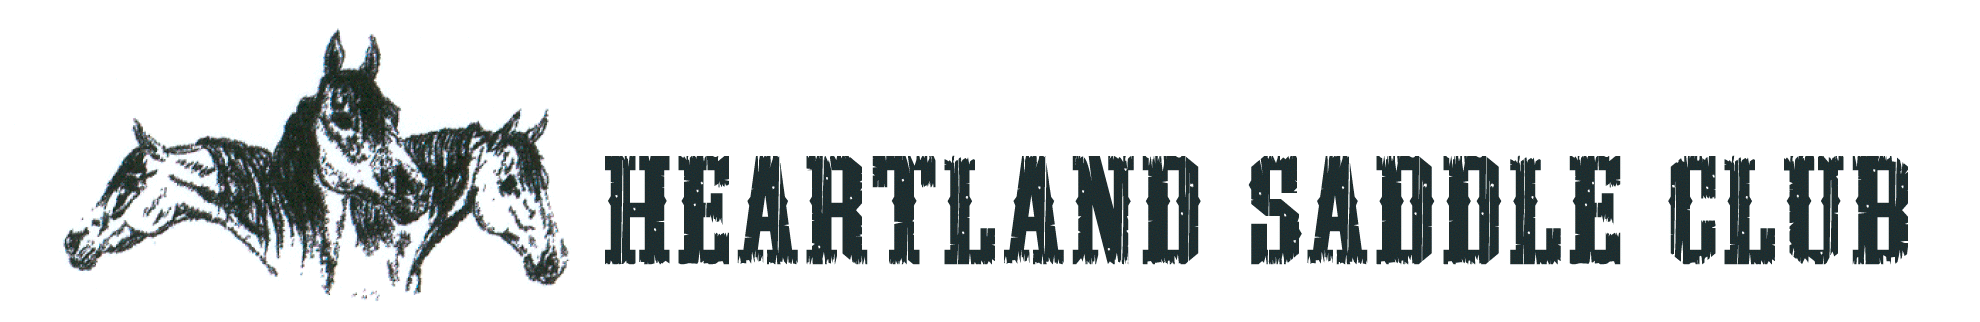 Heartland Saddle Club